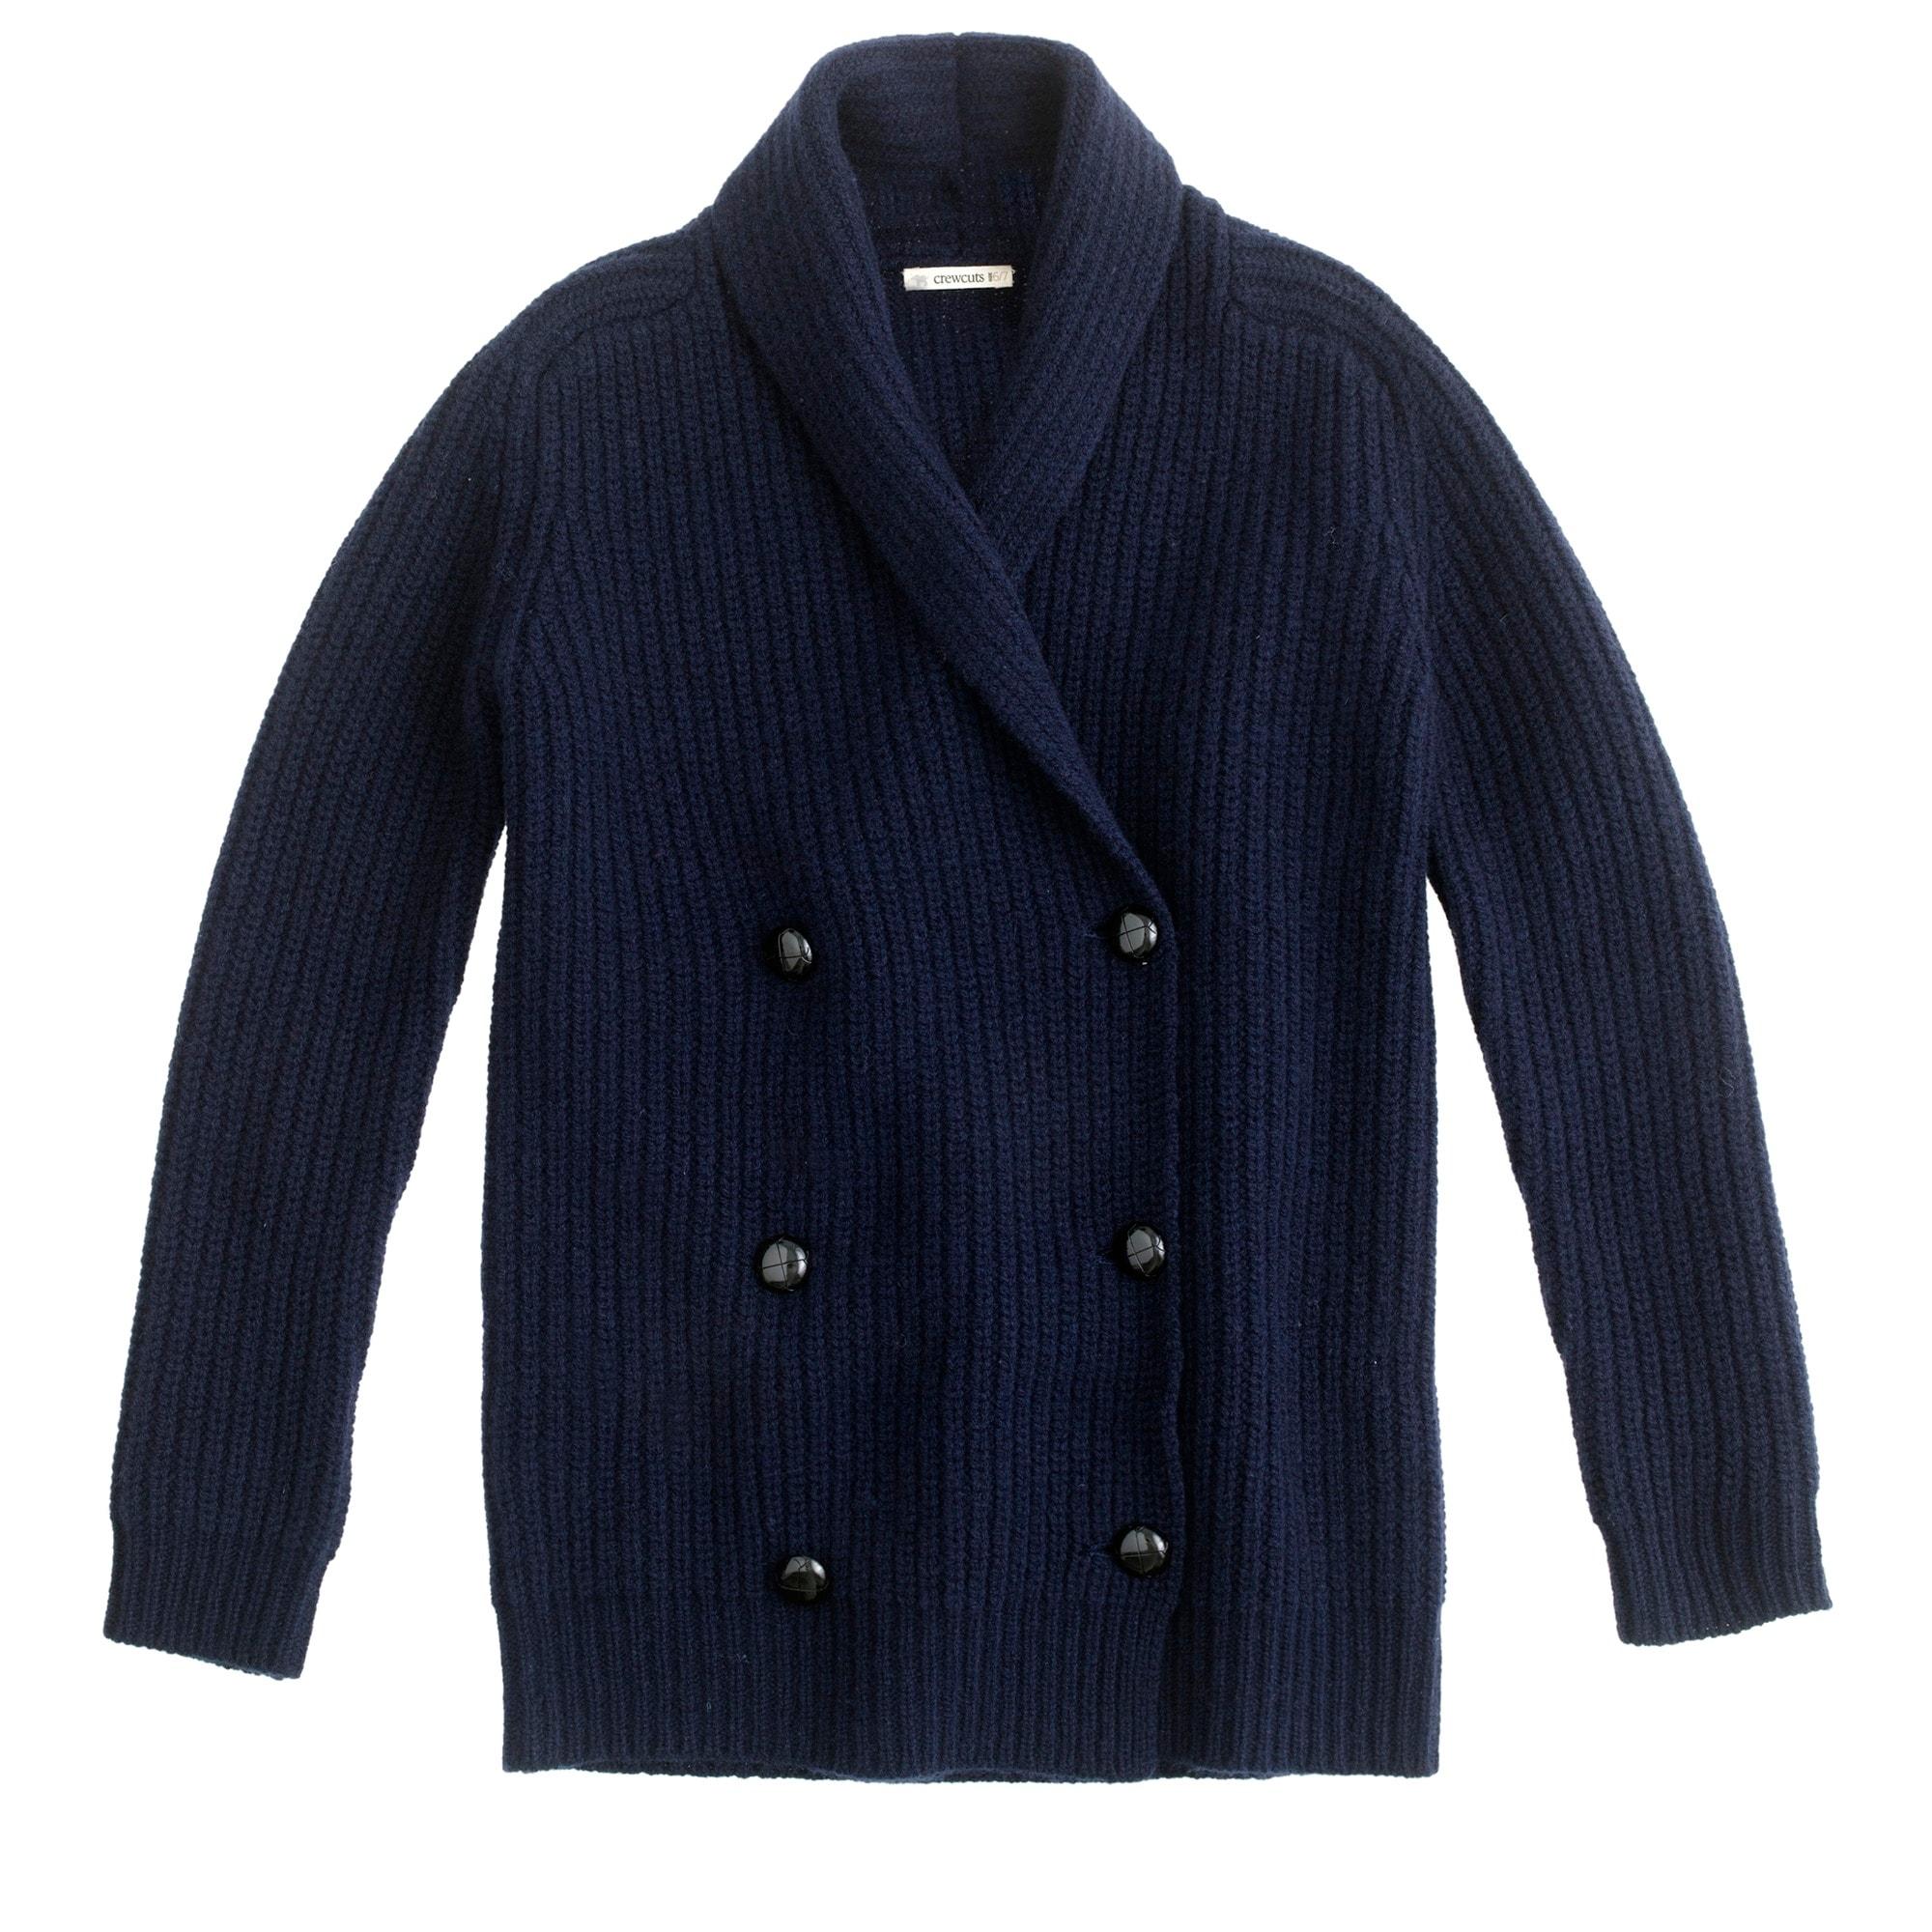 Girls' shawl-collar sweater-jacket